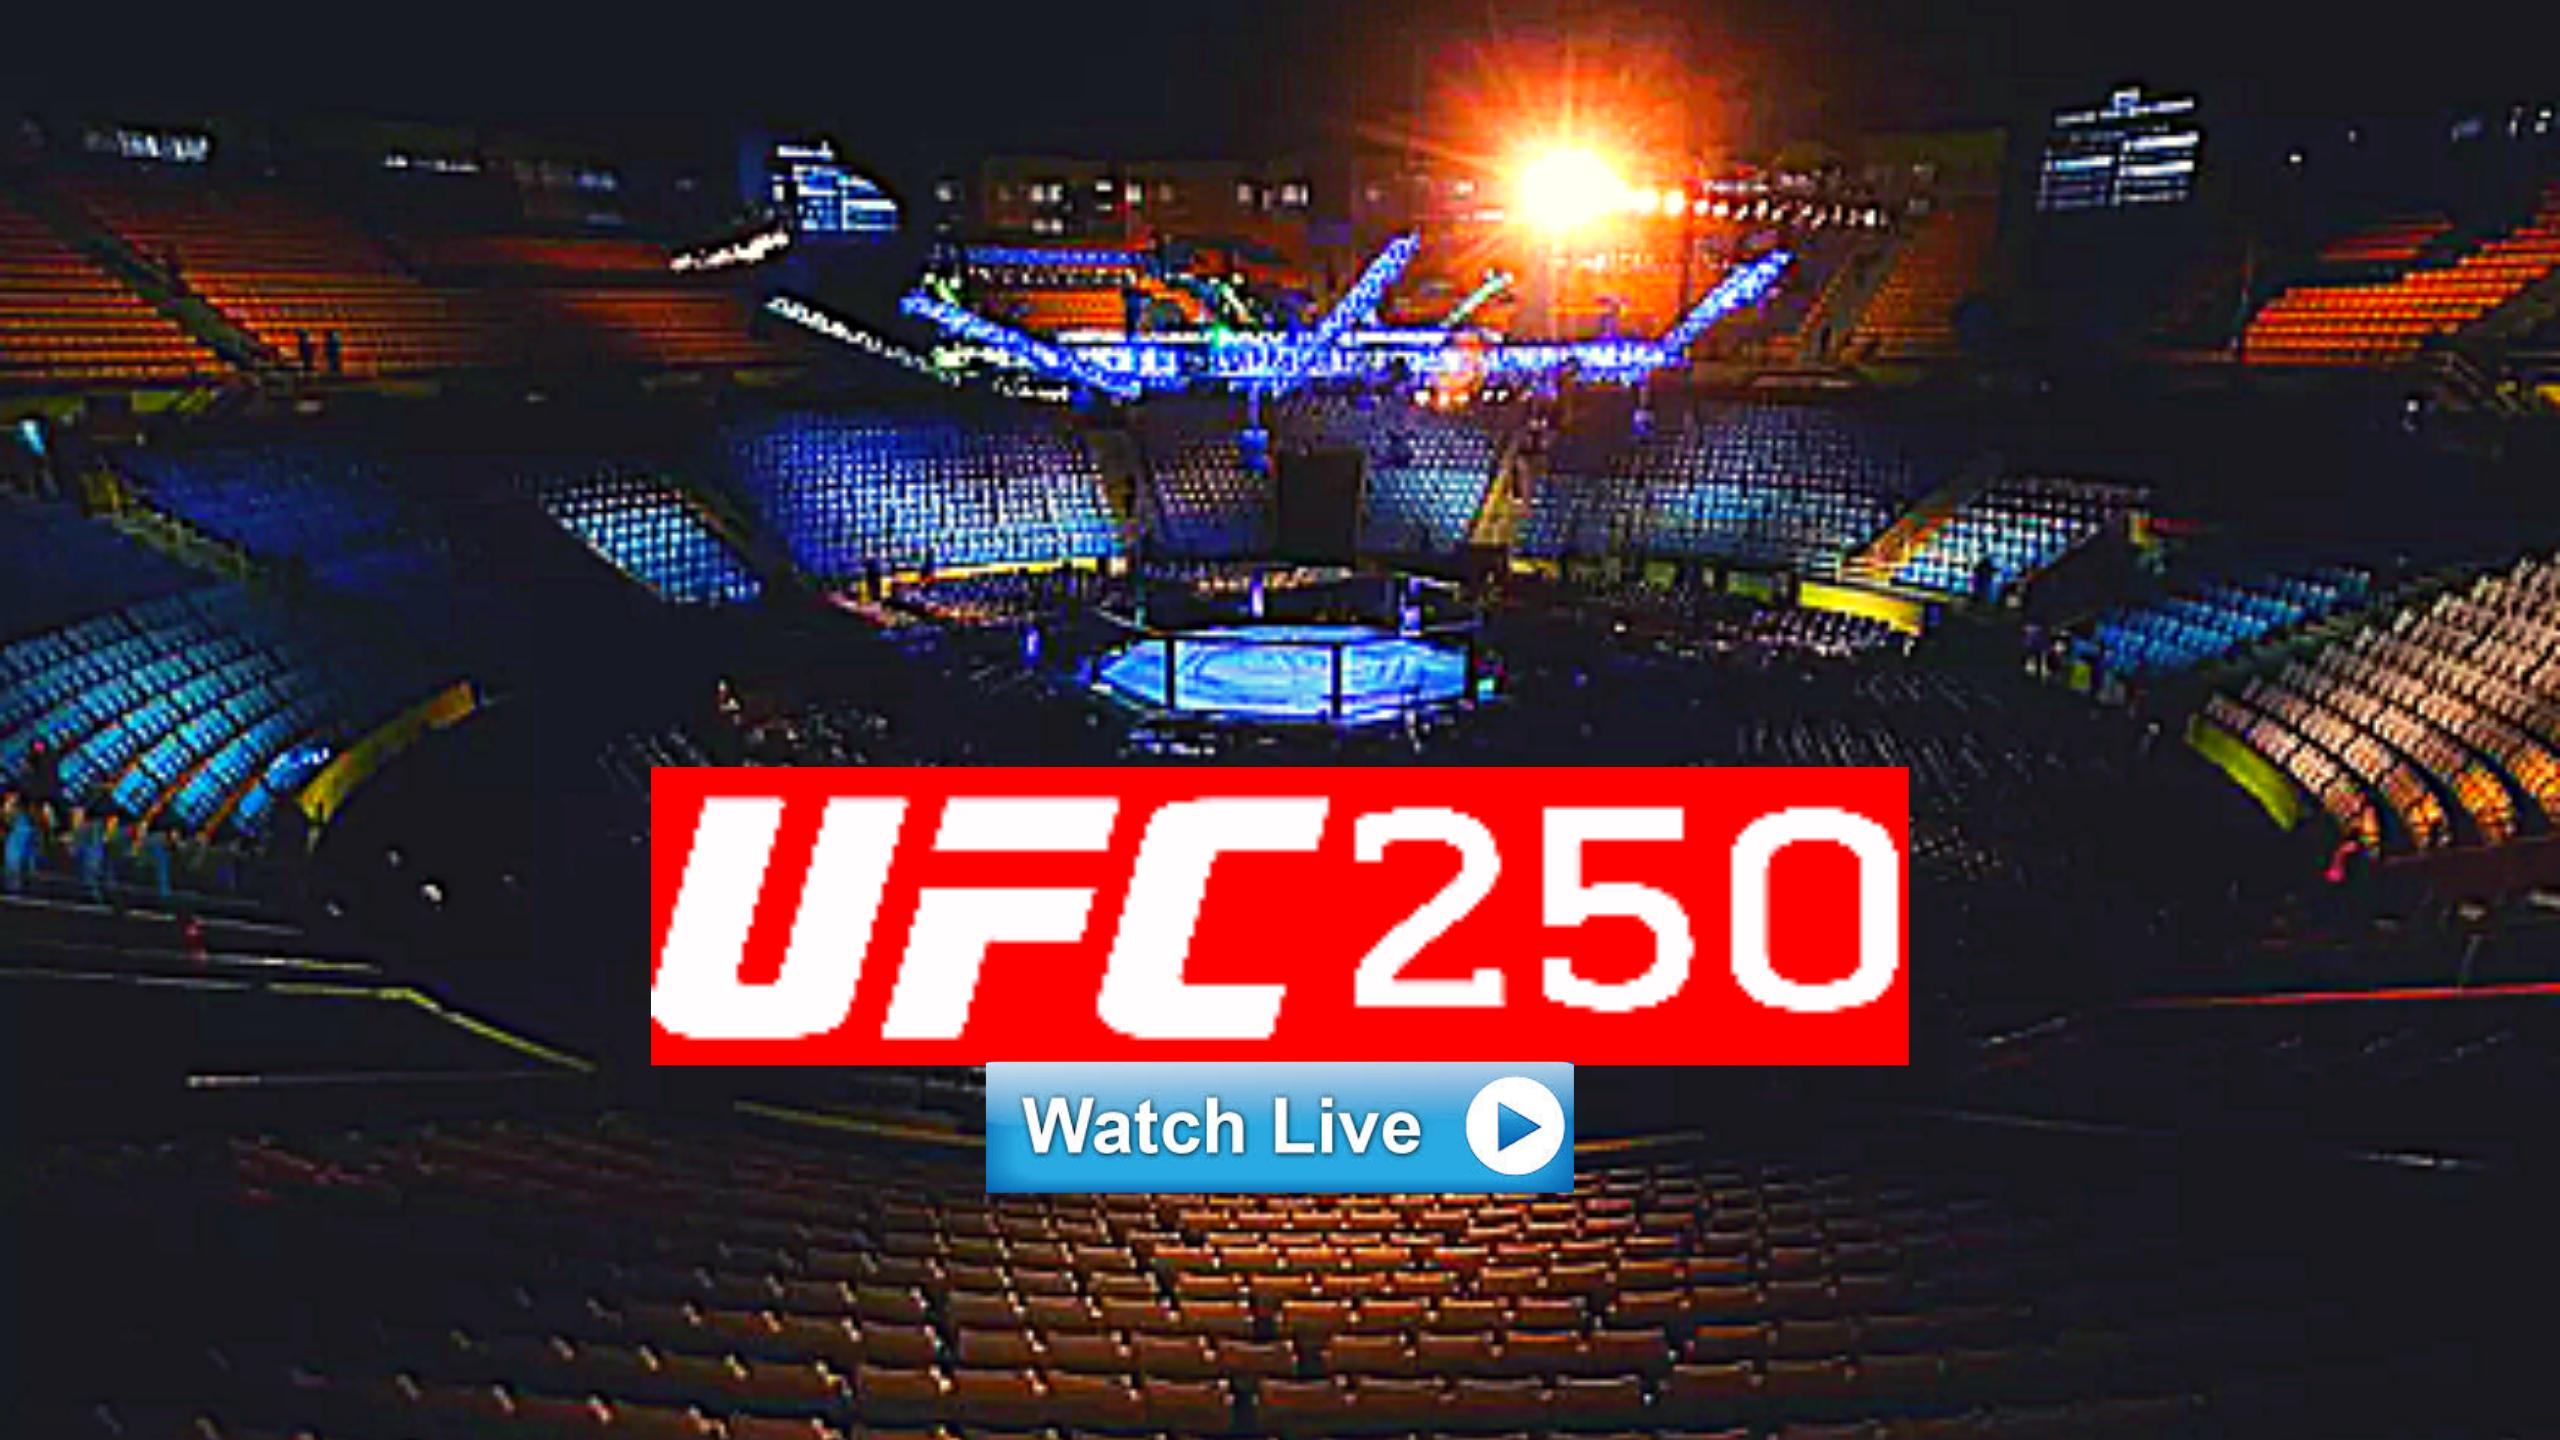 Ufc 250 Vs Ufc 250 Live Stream In 2020 Ufc Streaming Live Streaming